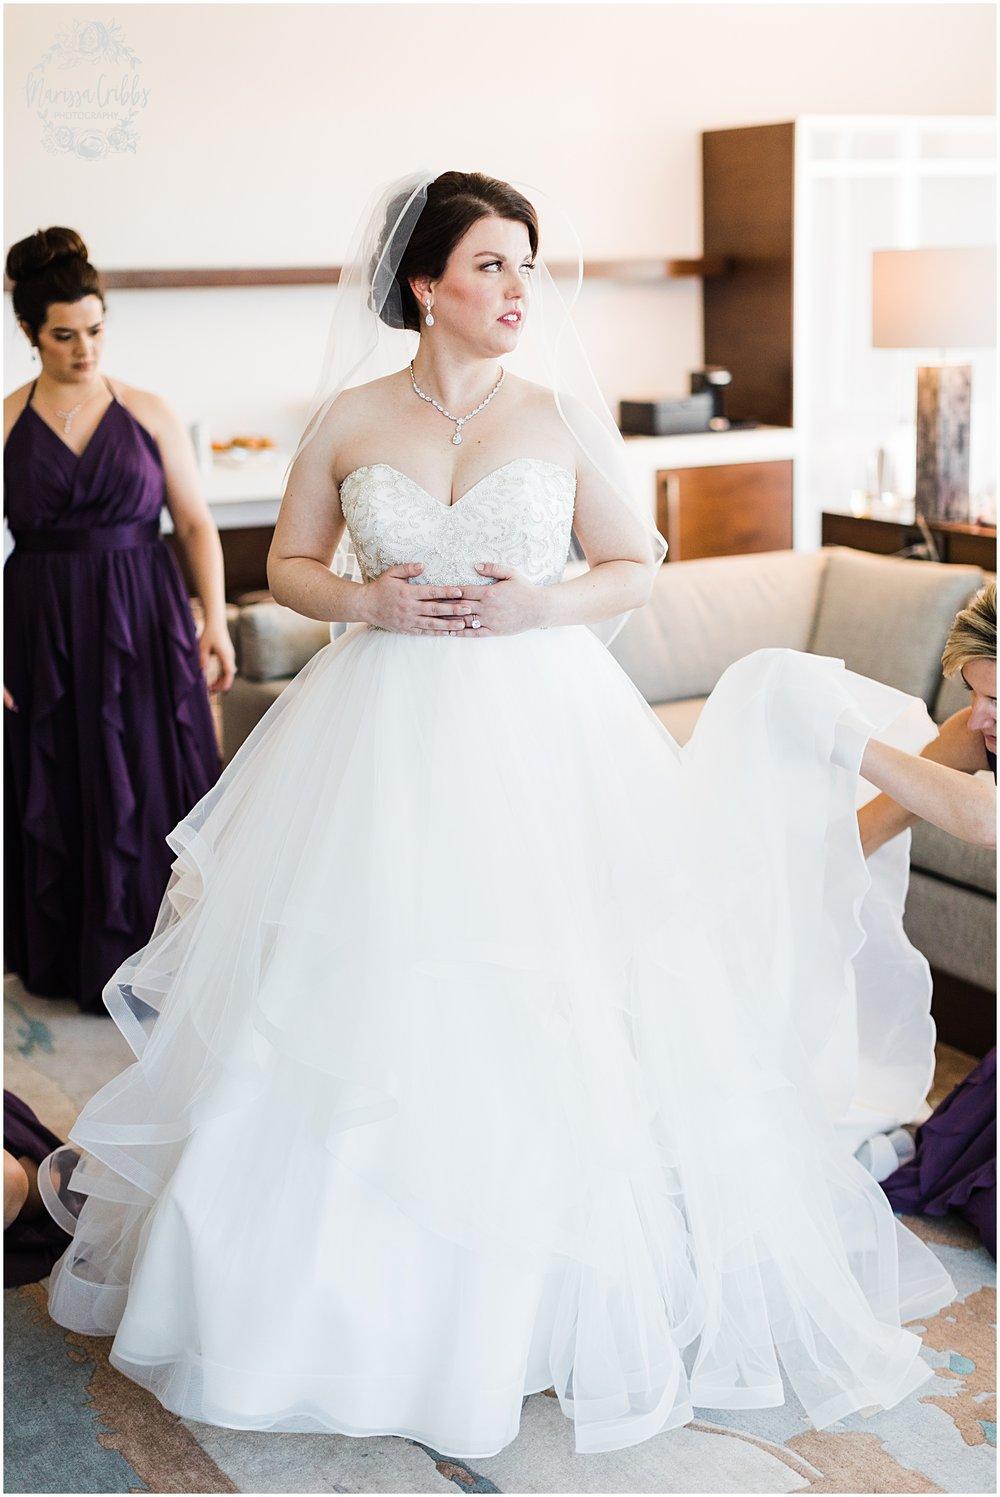 LAURA & DAN MARRIED | NELSON ATKINS MUSEUM | MARISSA CRIBBS PHOTOGRAPHY_6988.jpg